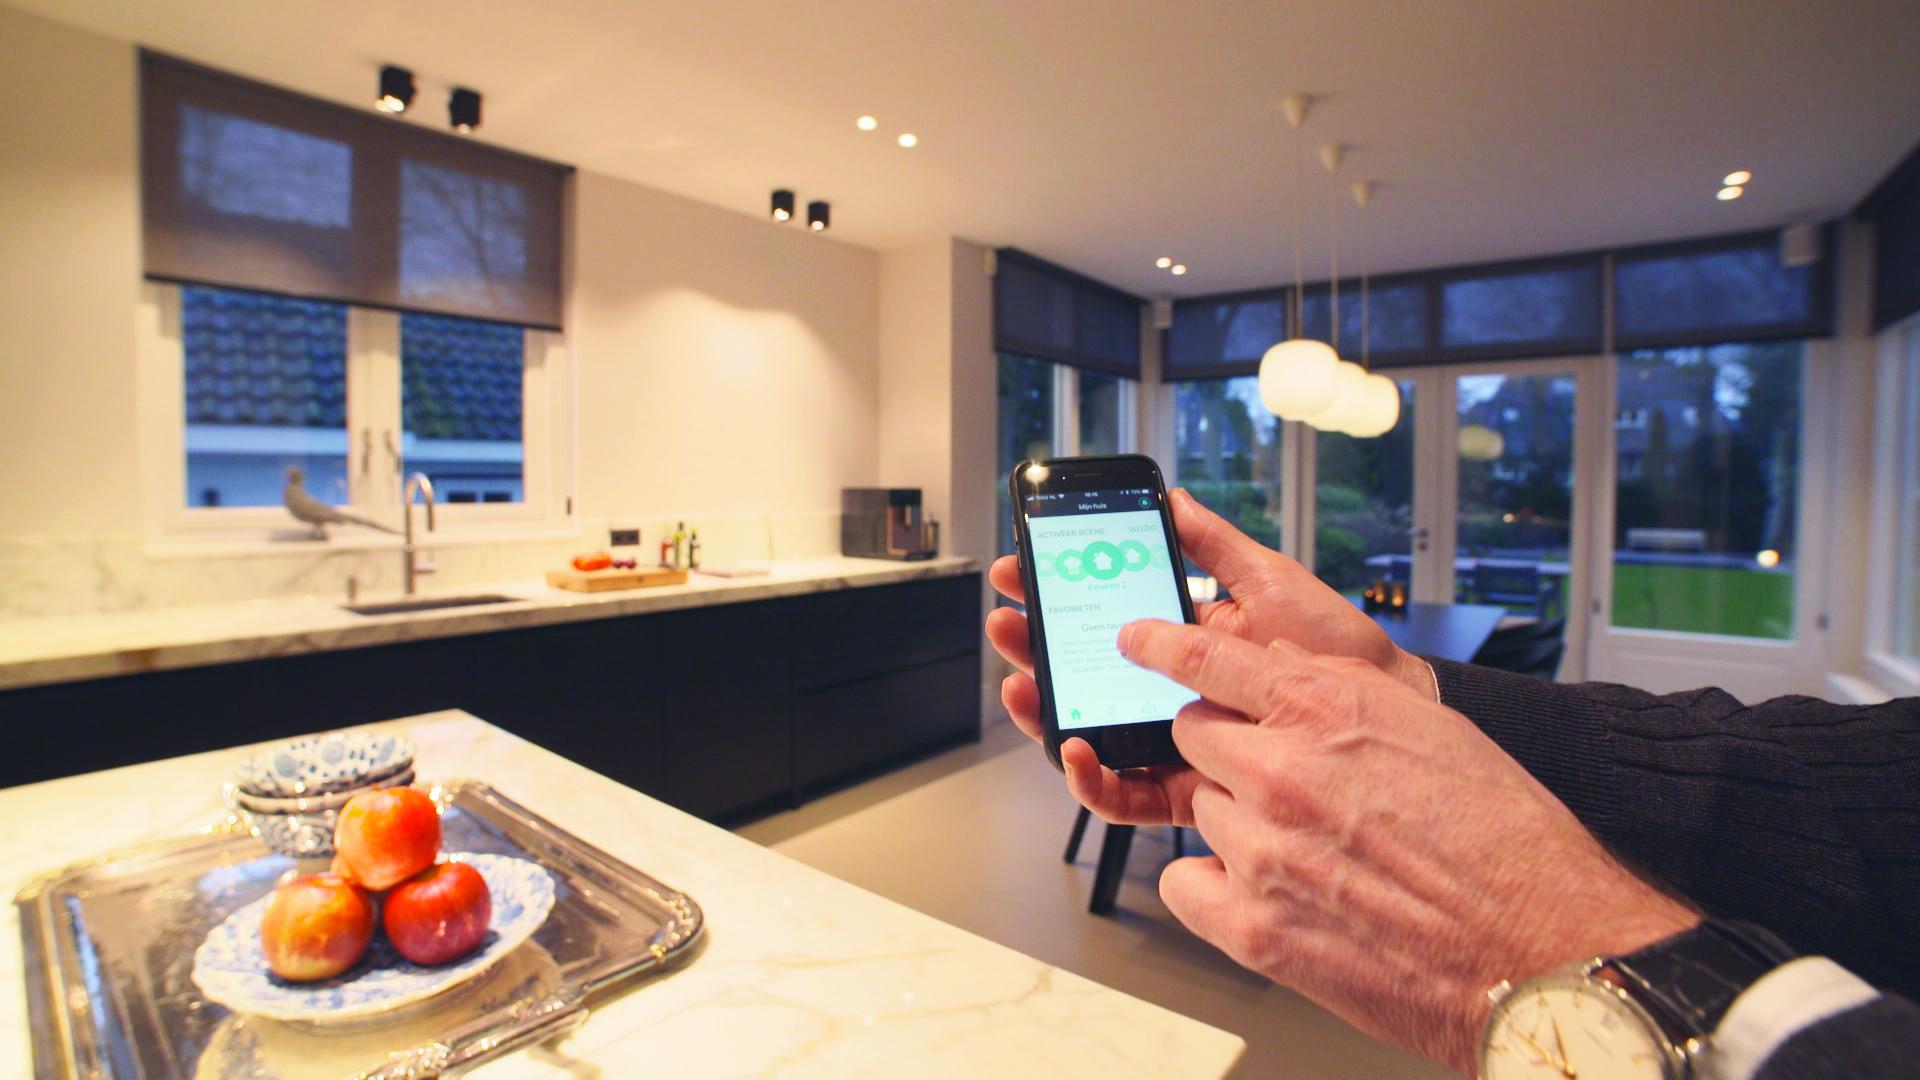 jung enet smart home bij verbouwing stadsvilla hateha. Black Bedroom Furniture Sets. Home Design Ideas